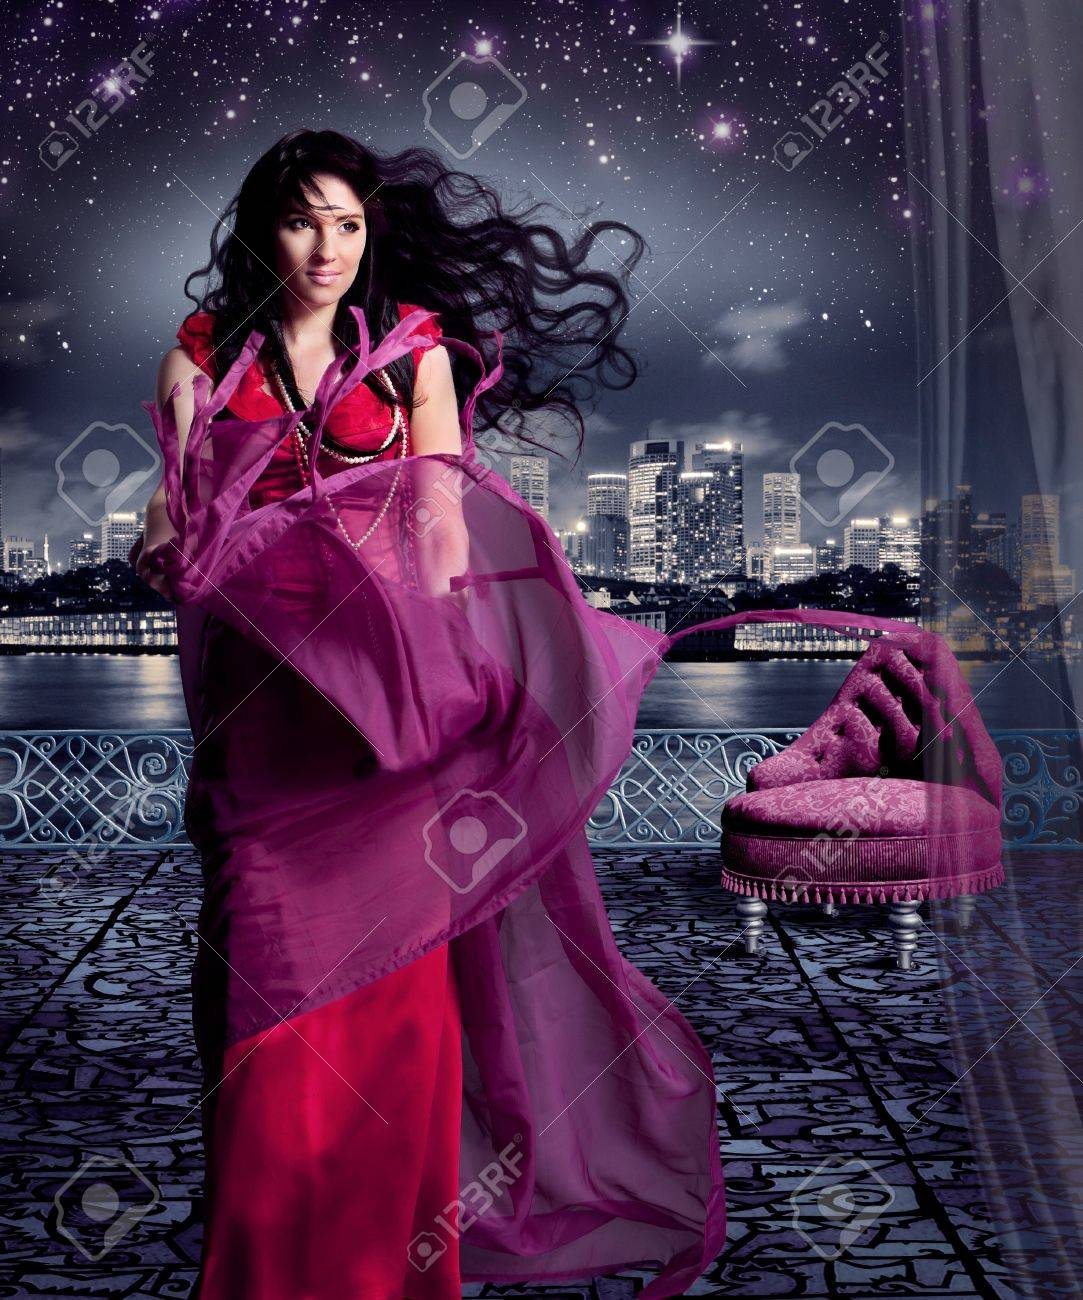 beautiful girl in evening dress on a terrace, like cinderella Stock Photo - 15385396